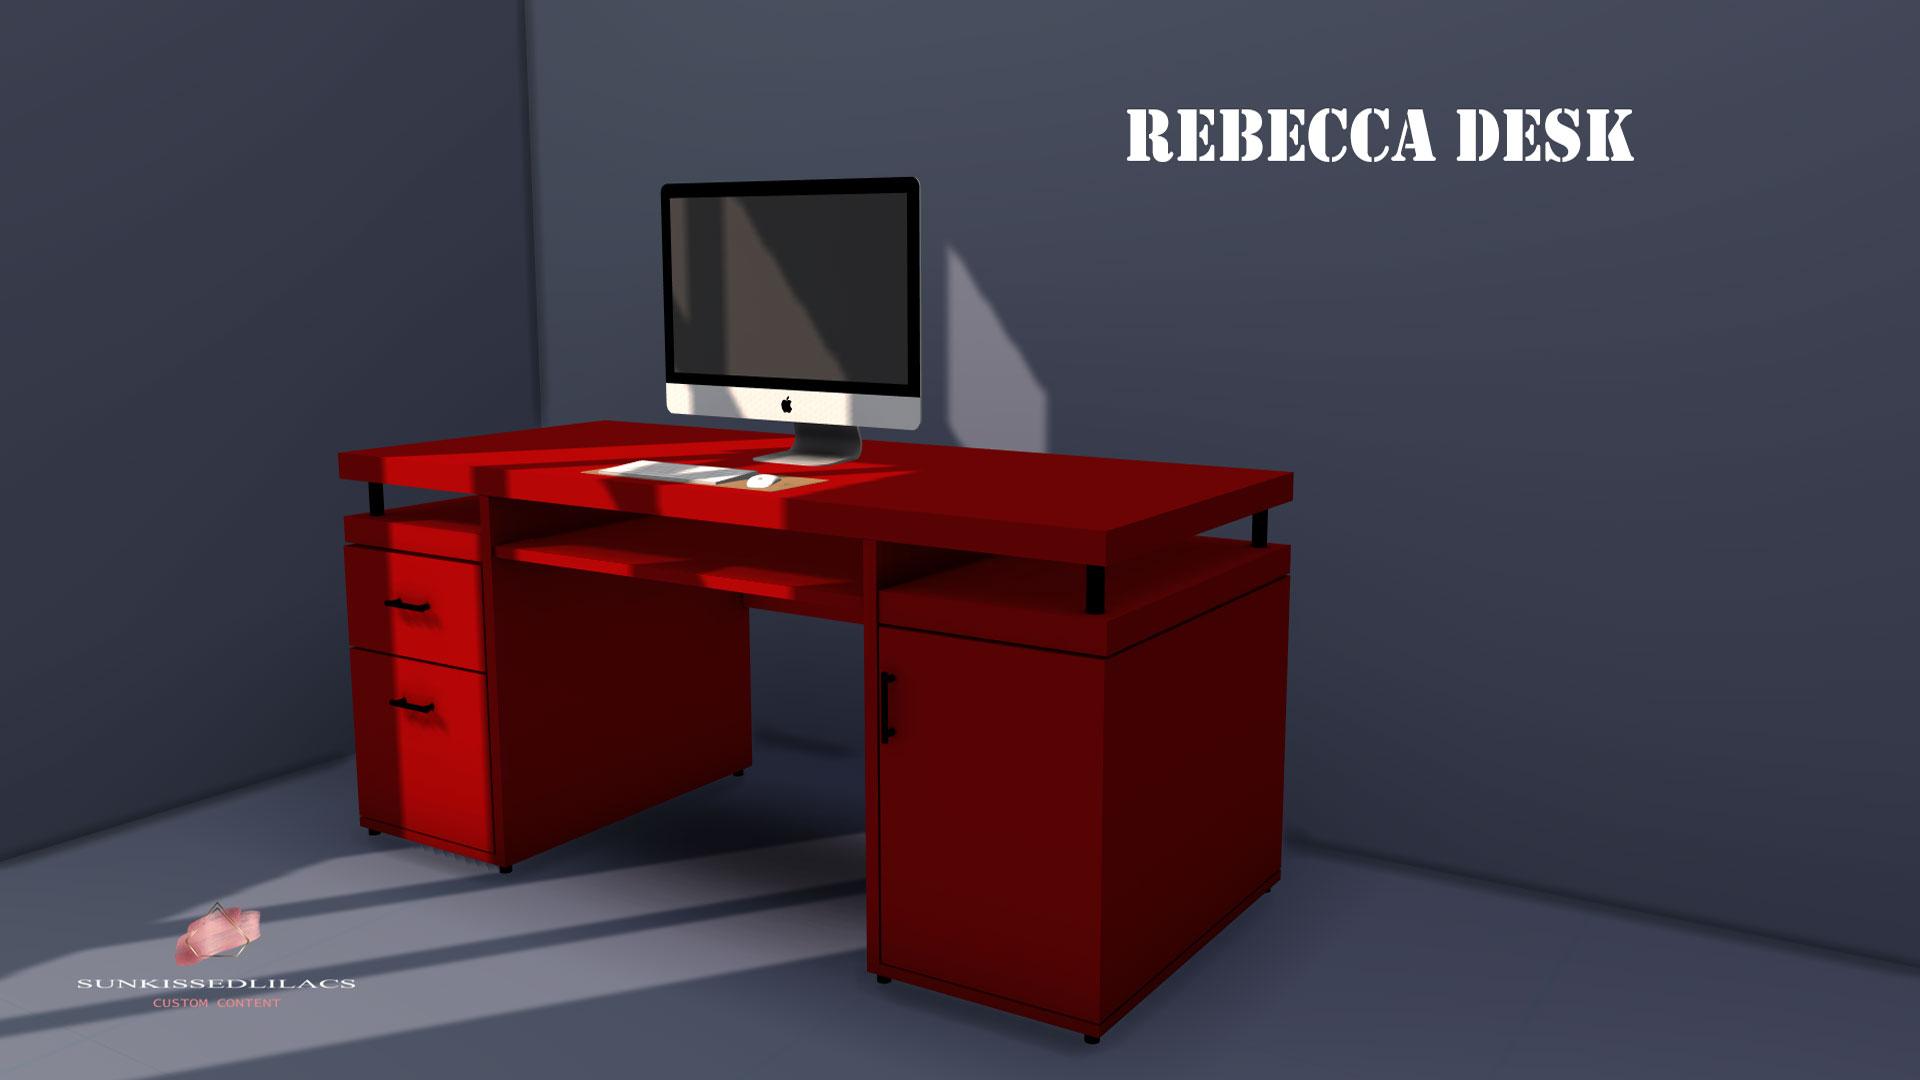 Rebecca desk-sunkissedlilacs-simms-4-custom-content